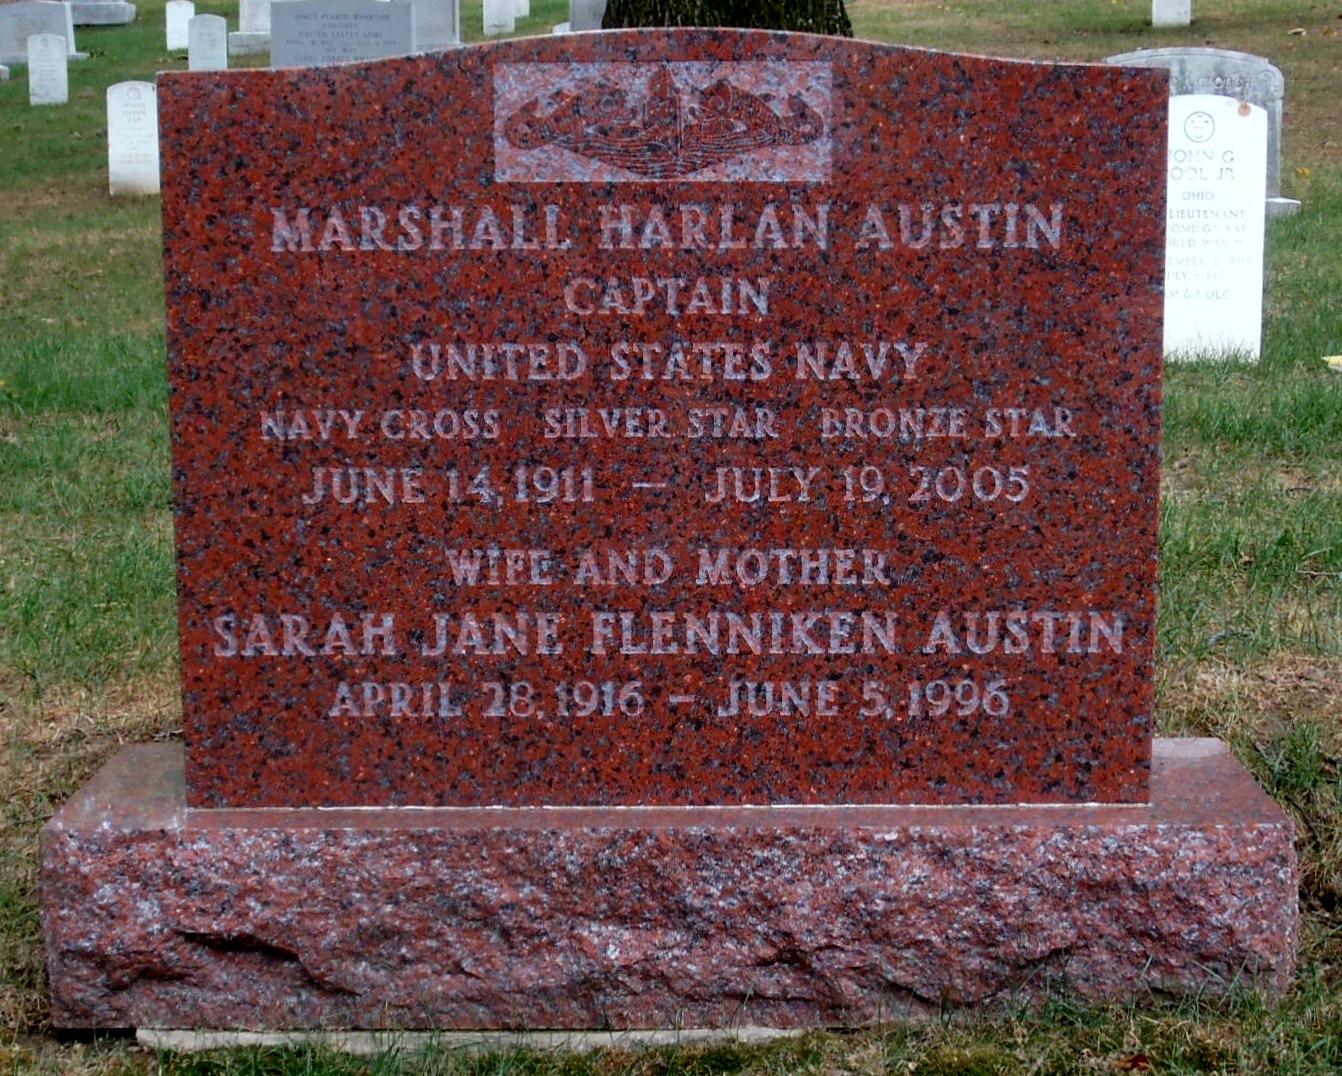 Marshall Harlan Austin